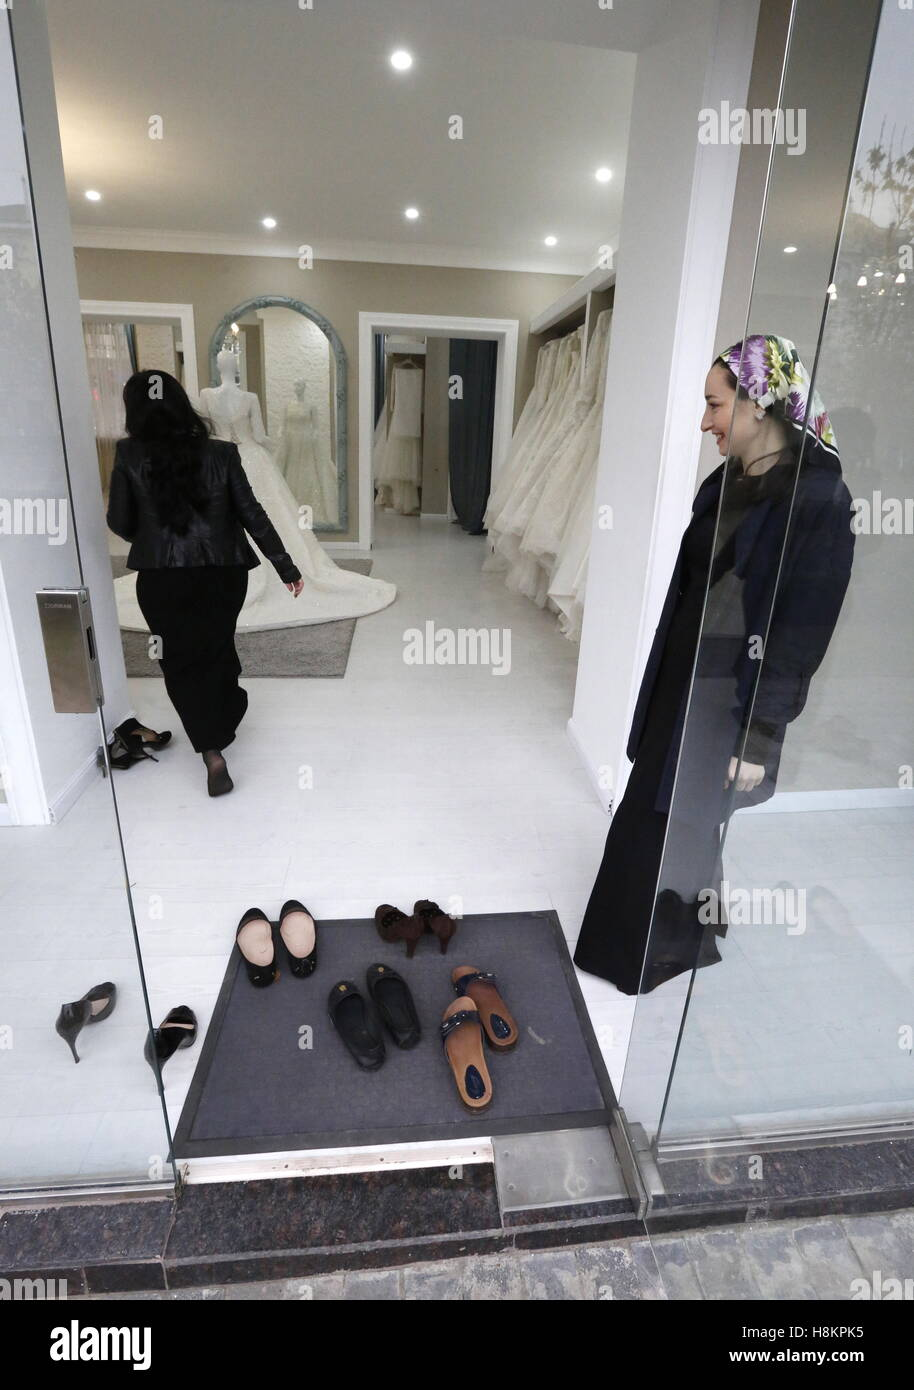 Grozny, Russia. 13th Nov, 2016. Inside a Marry Me bridal shop. © Valery Matytsin/TASS/Alamy Live News - Stock Image